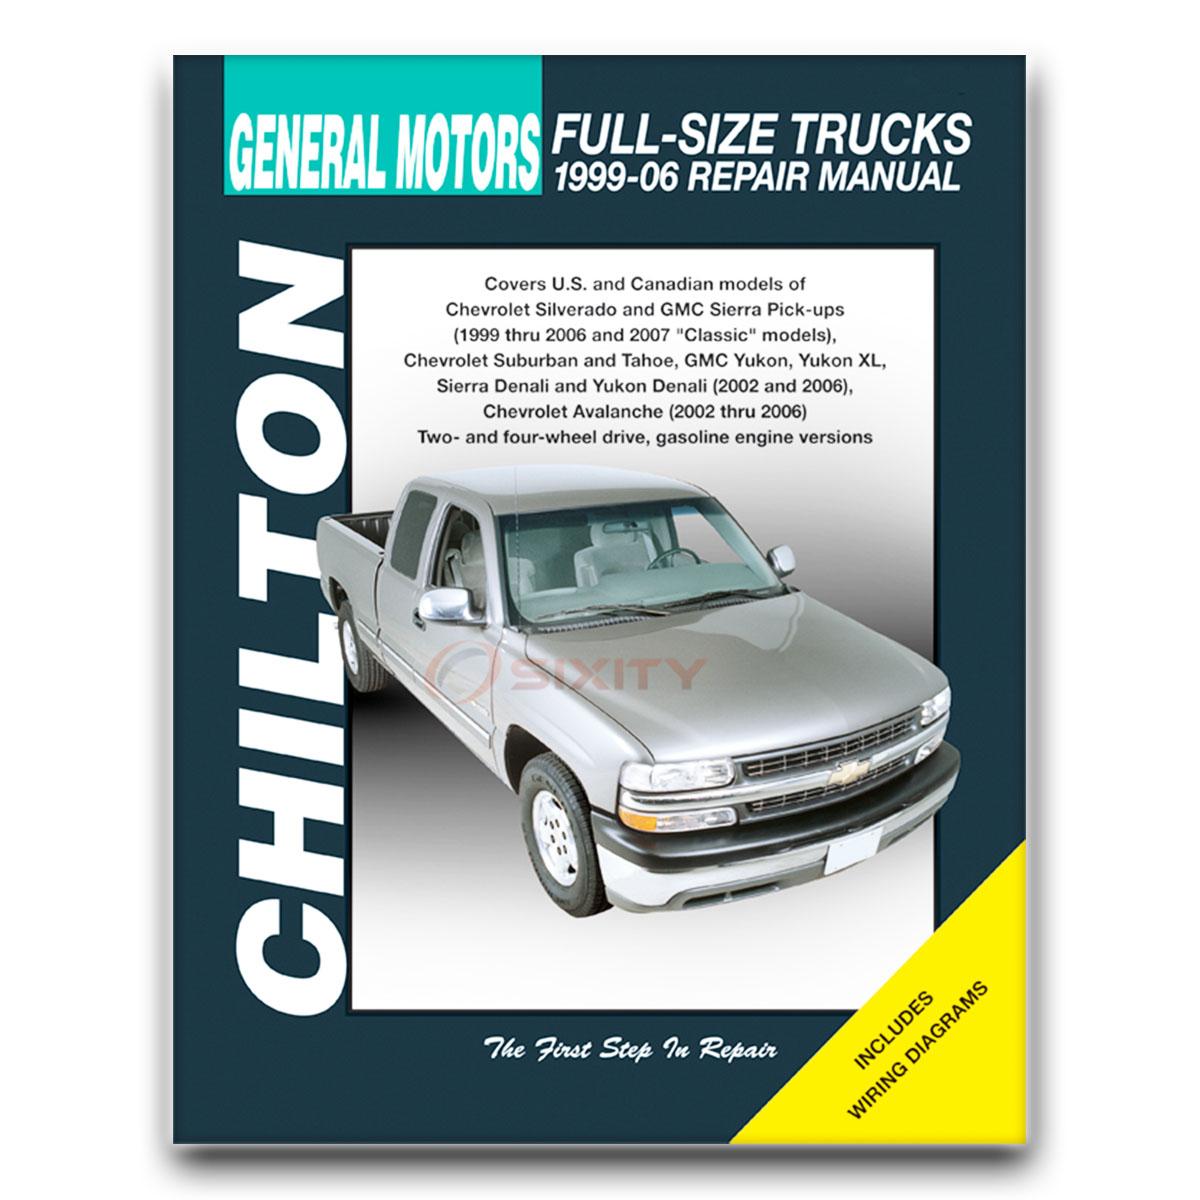 chevy suburban 1500 z71 ls rh ebay com 2005 Chevy Suburban 1999 Chevy Suburban